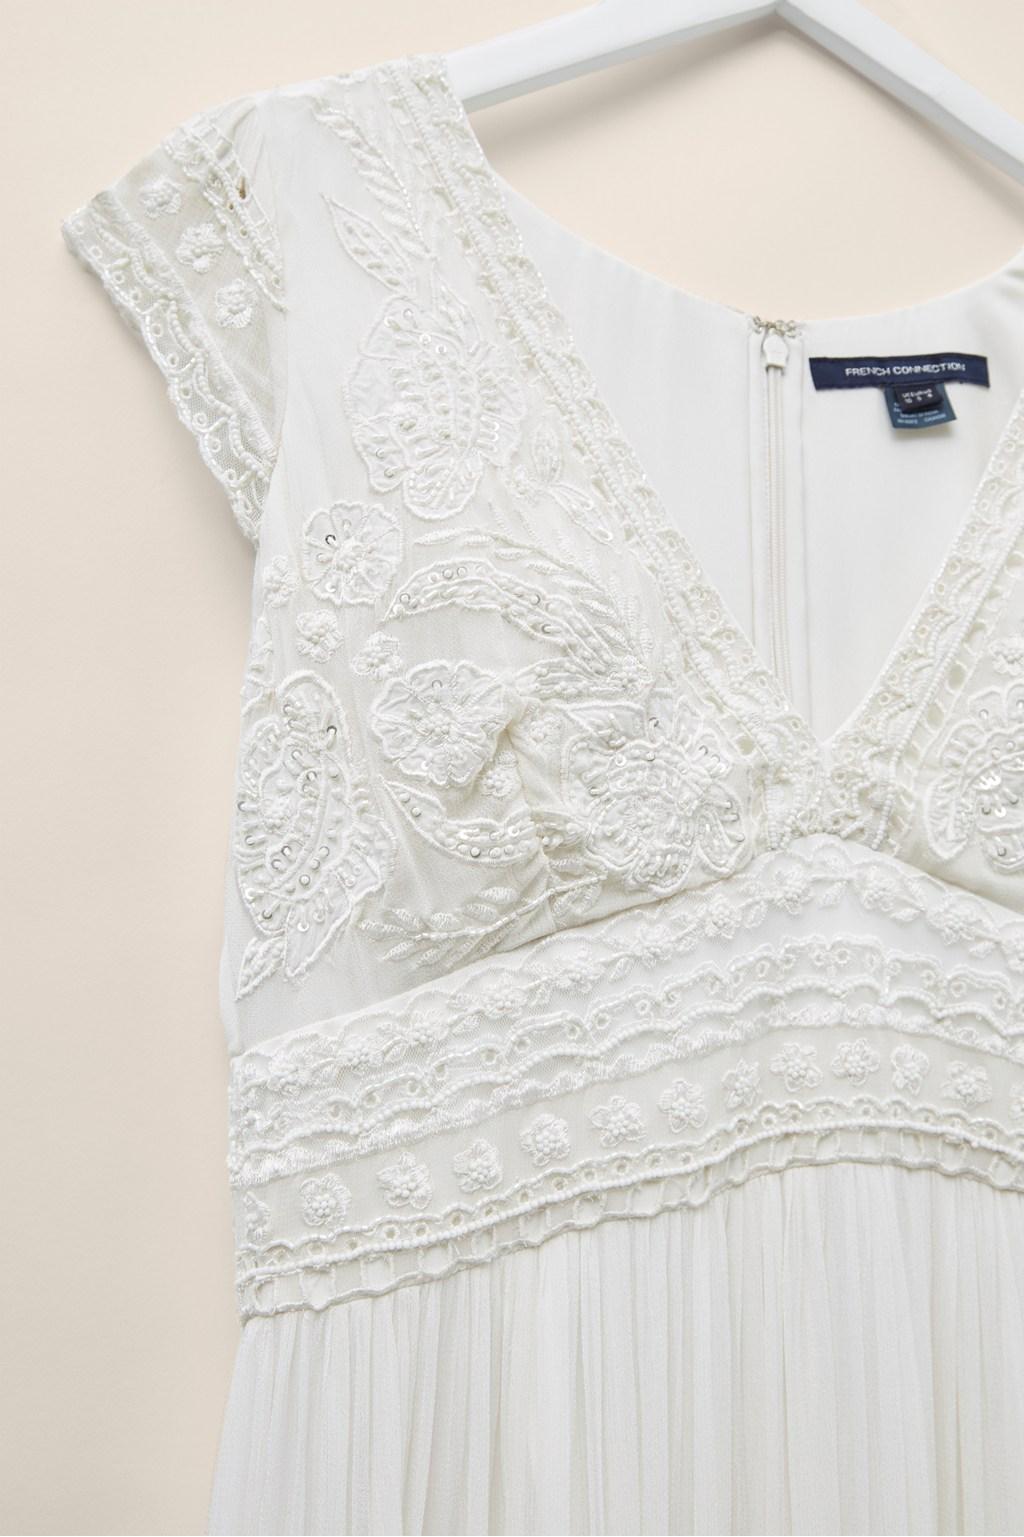 71jnr-womens-de-summerwhite-palmero-embellished-wedding-dress-7.jpg